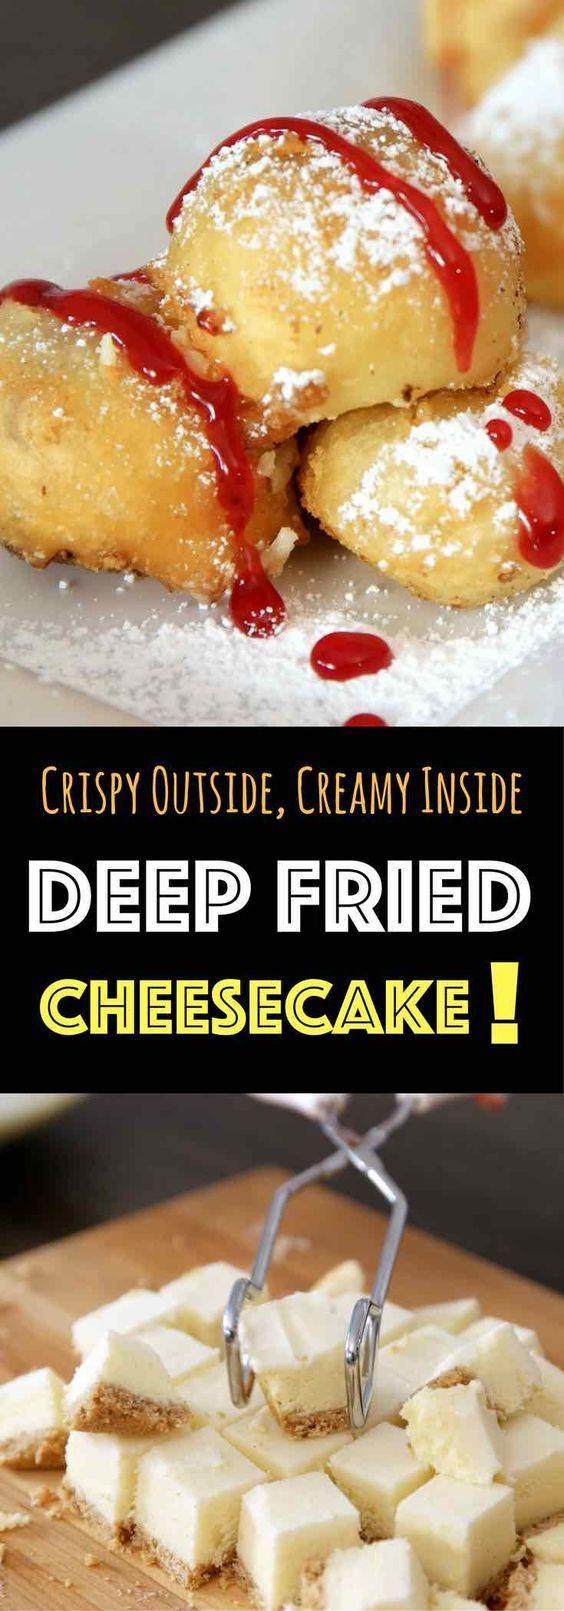 Deep Fried Cheesecake Bites